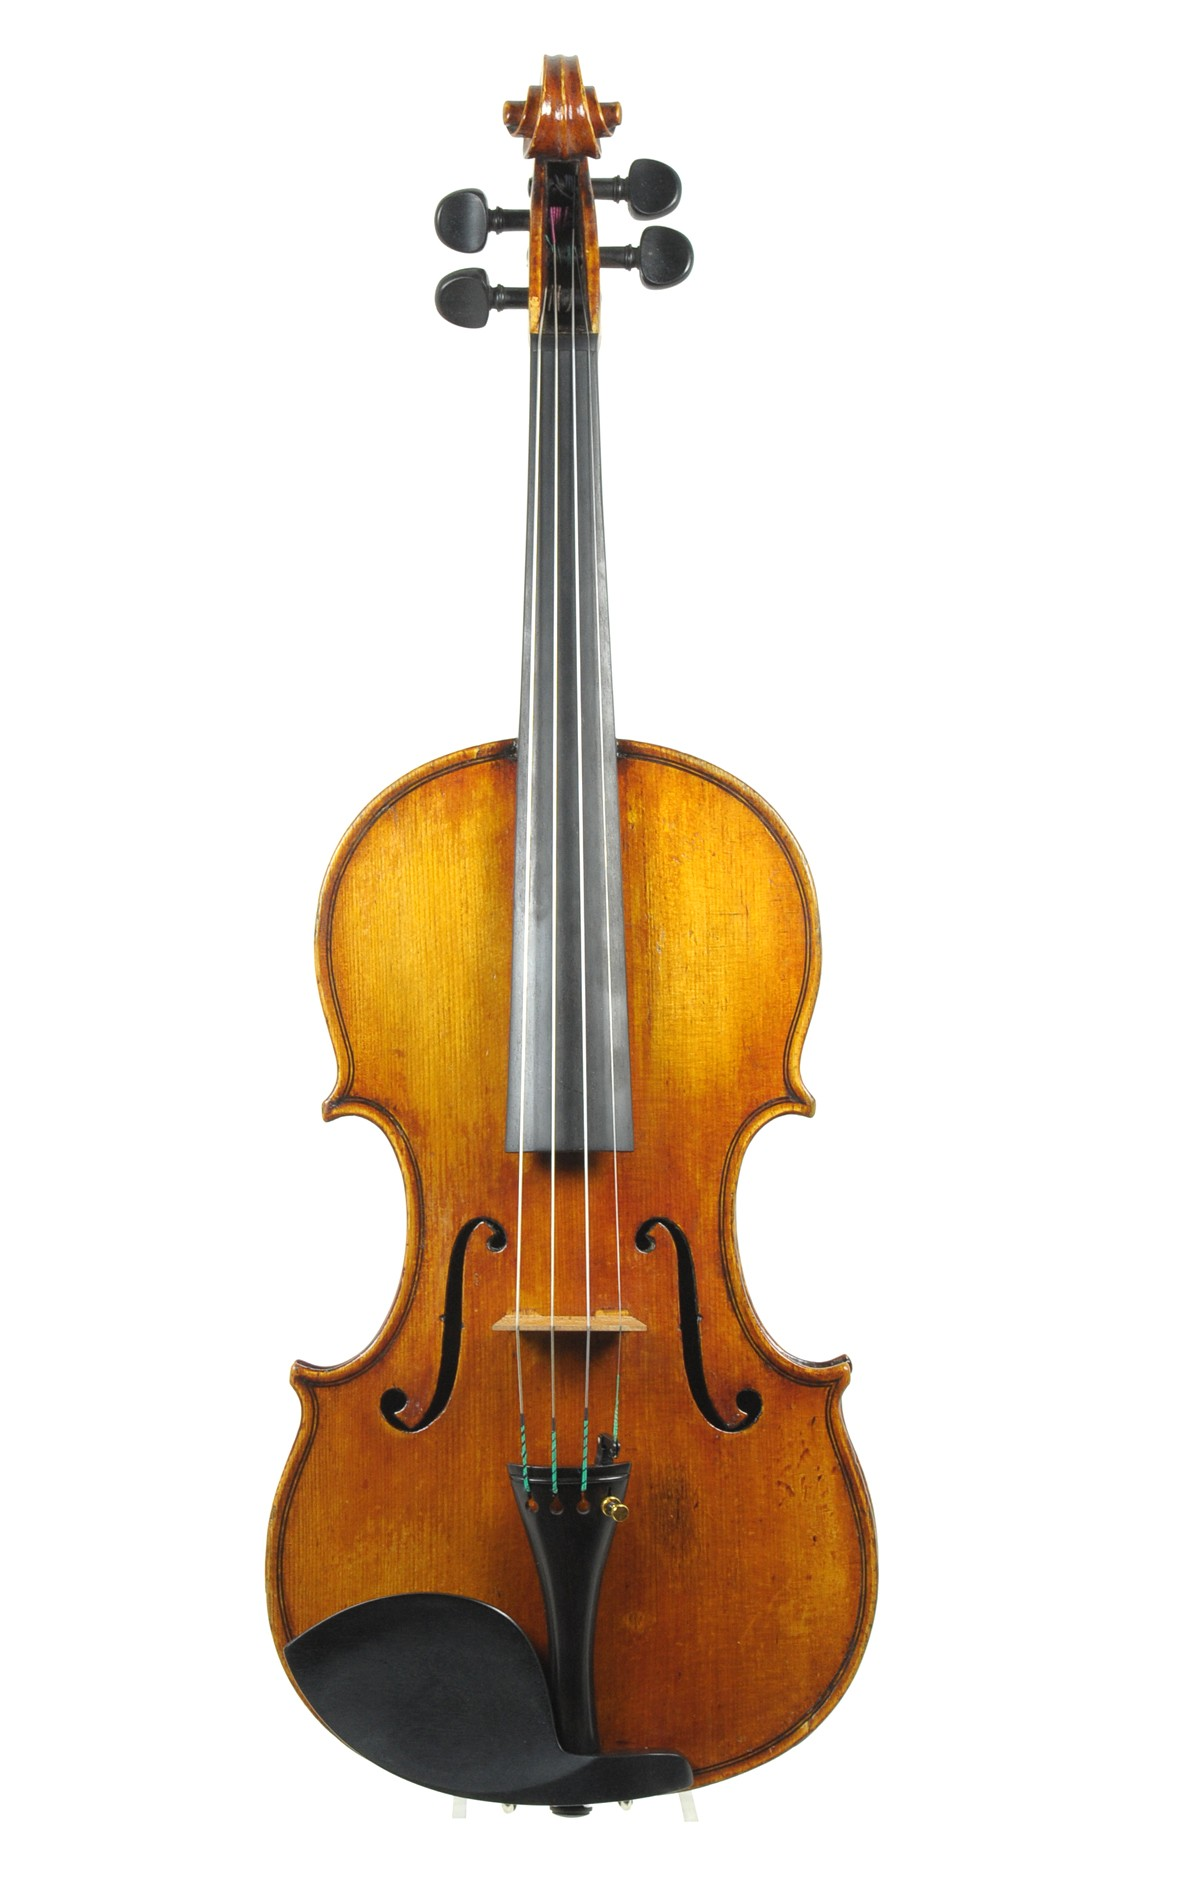 Italian violin by Michelangelo Puglisi, 1919